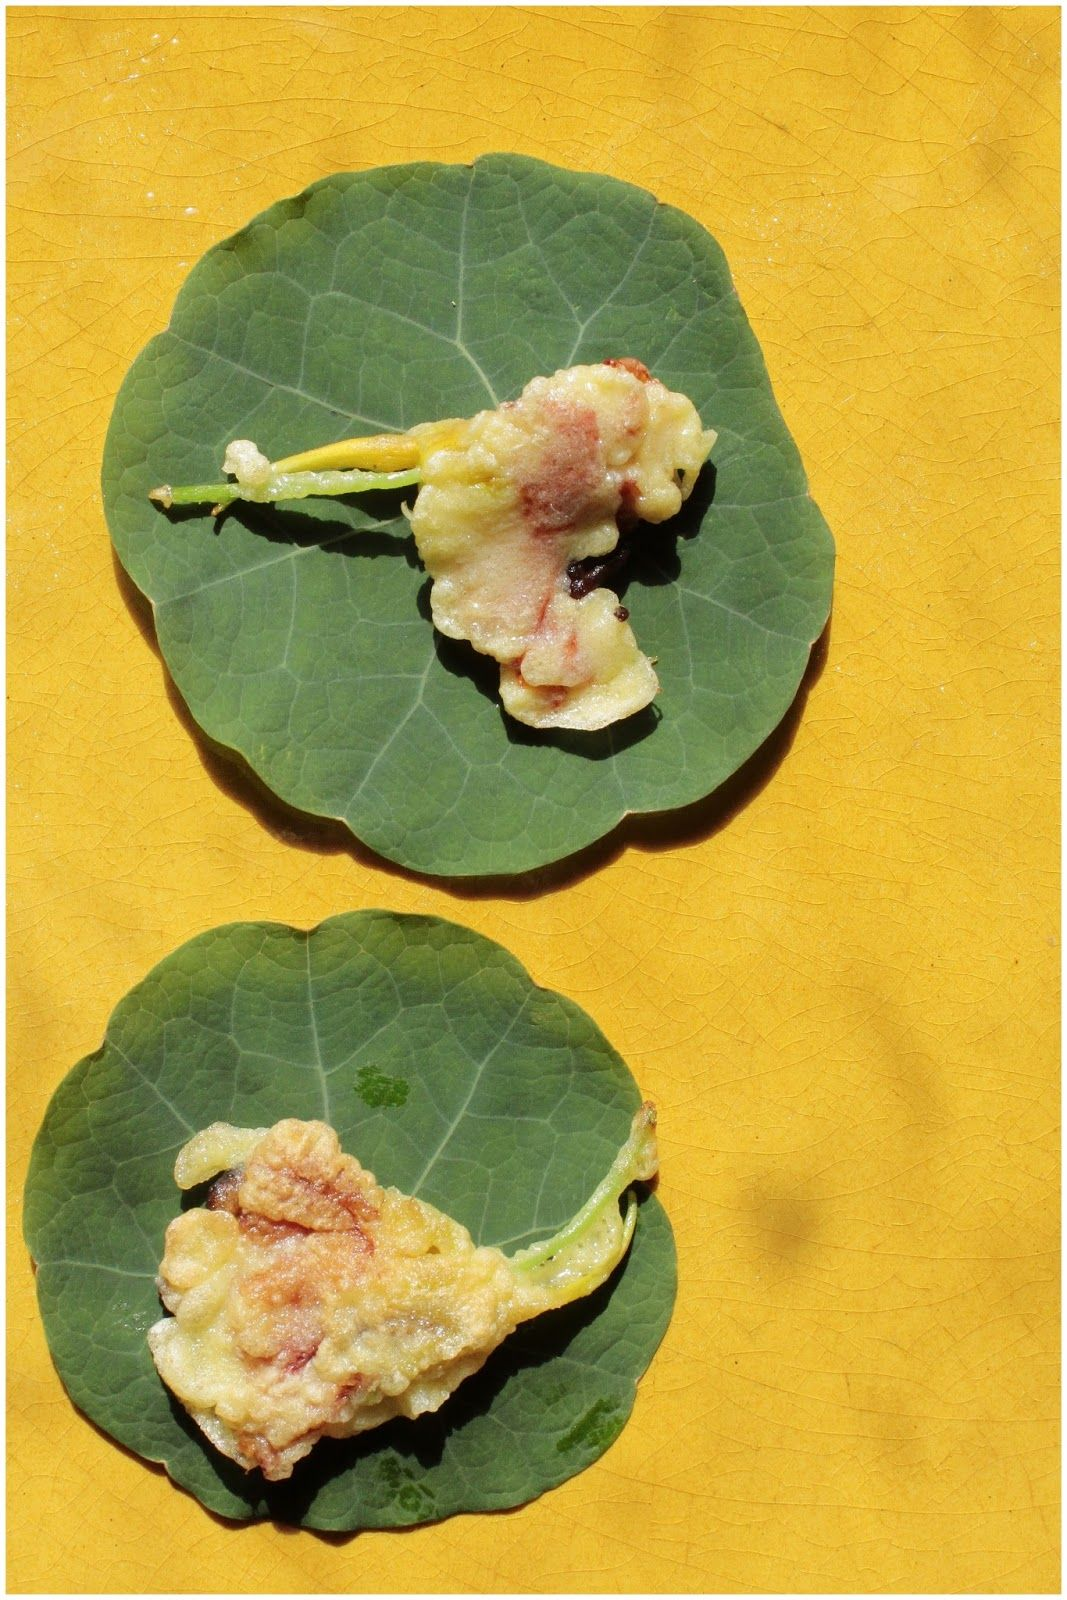 Brzuch Posypany Makiem Ogrod W Ciescie Plant Leaves Plants Leaves